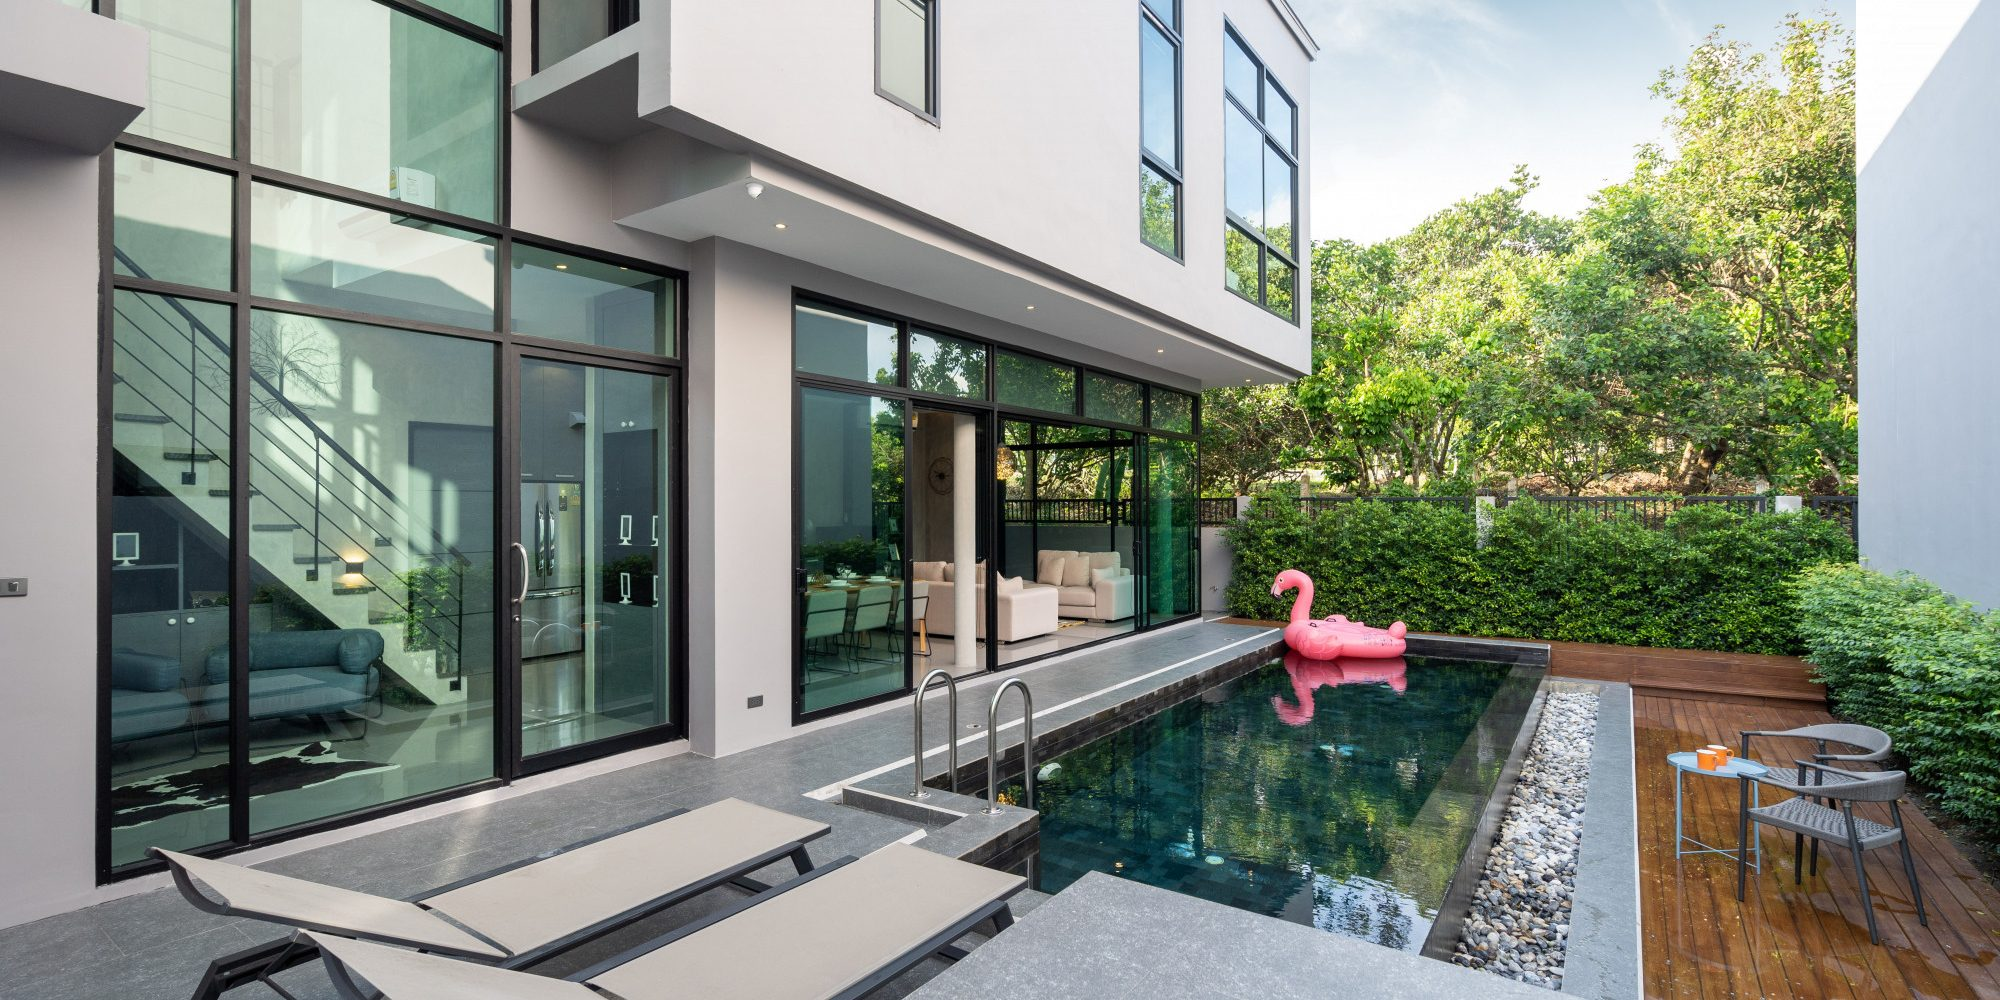 pool-terrace-pink-floating-duck-infinity-swimming-pool